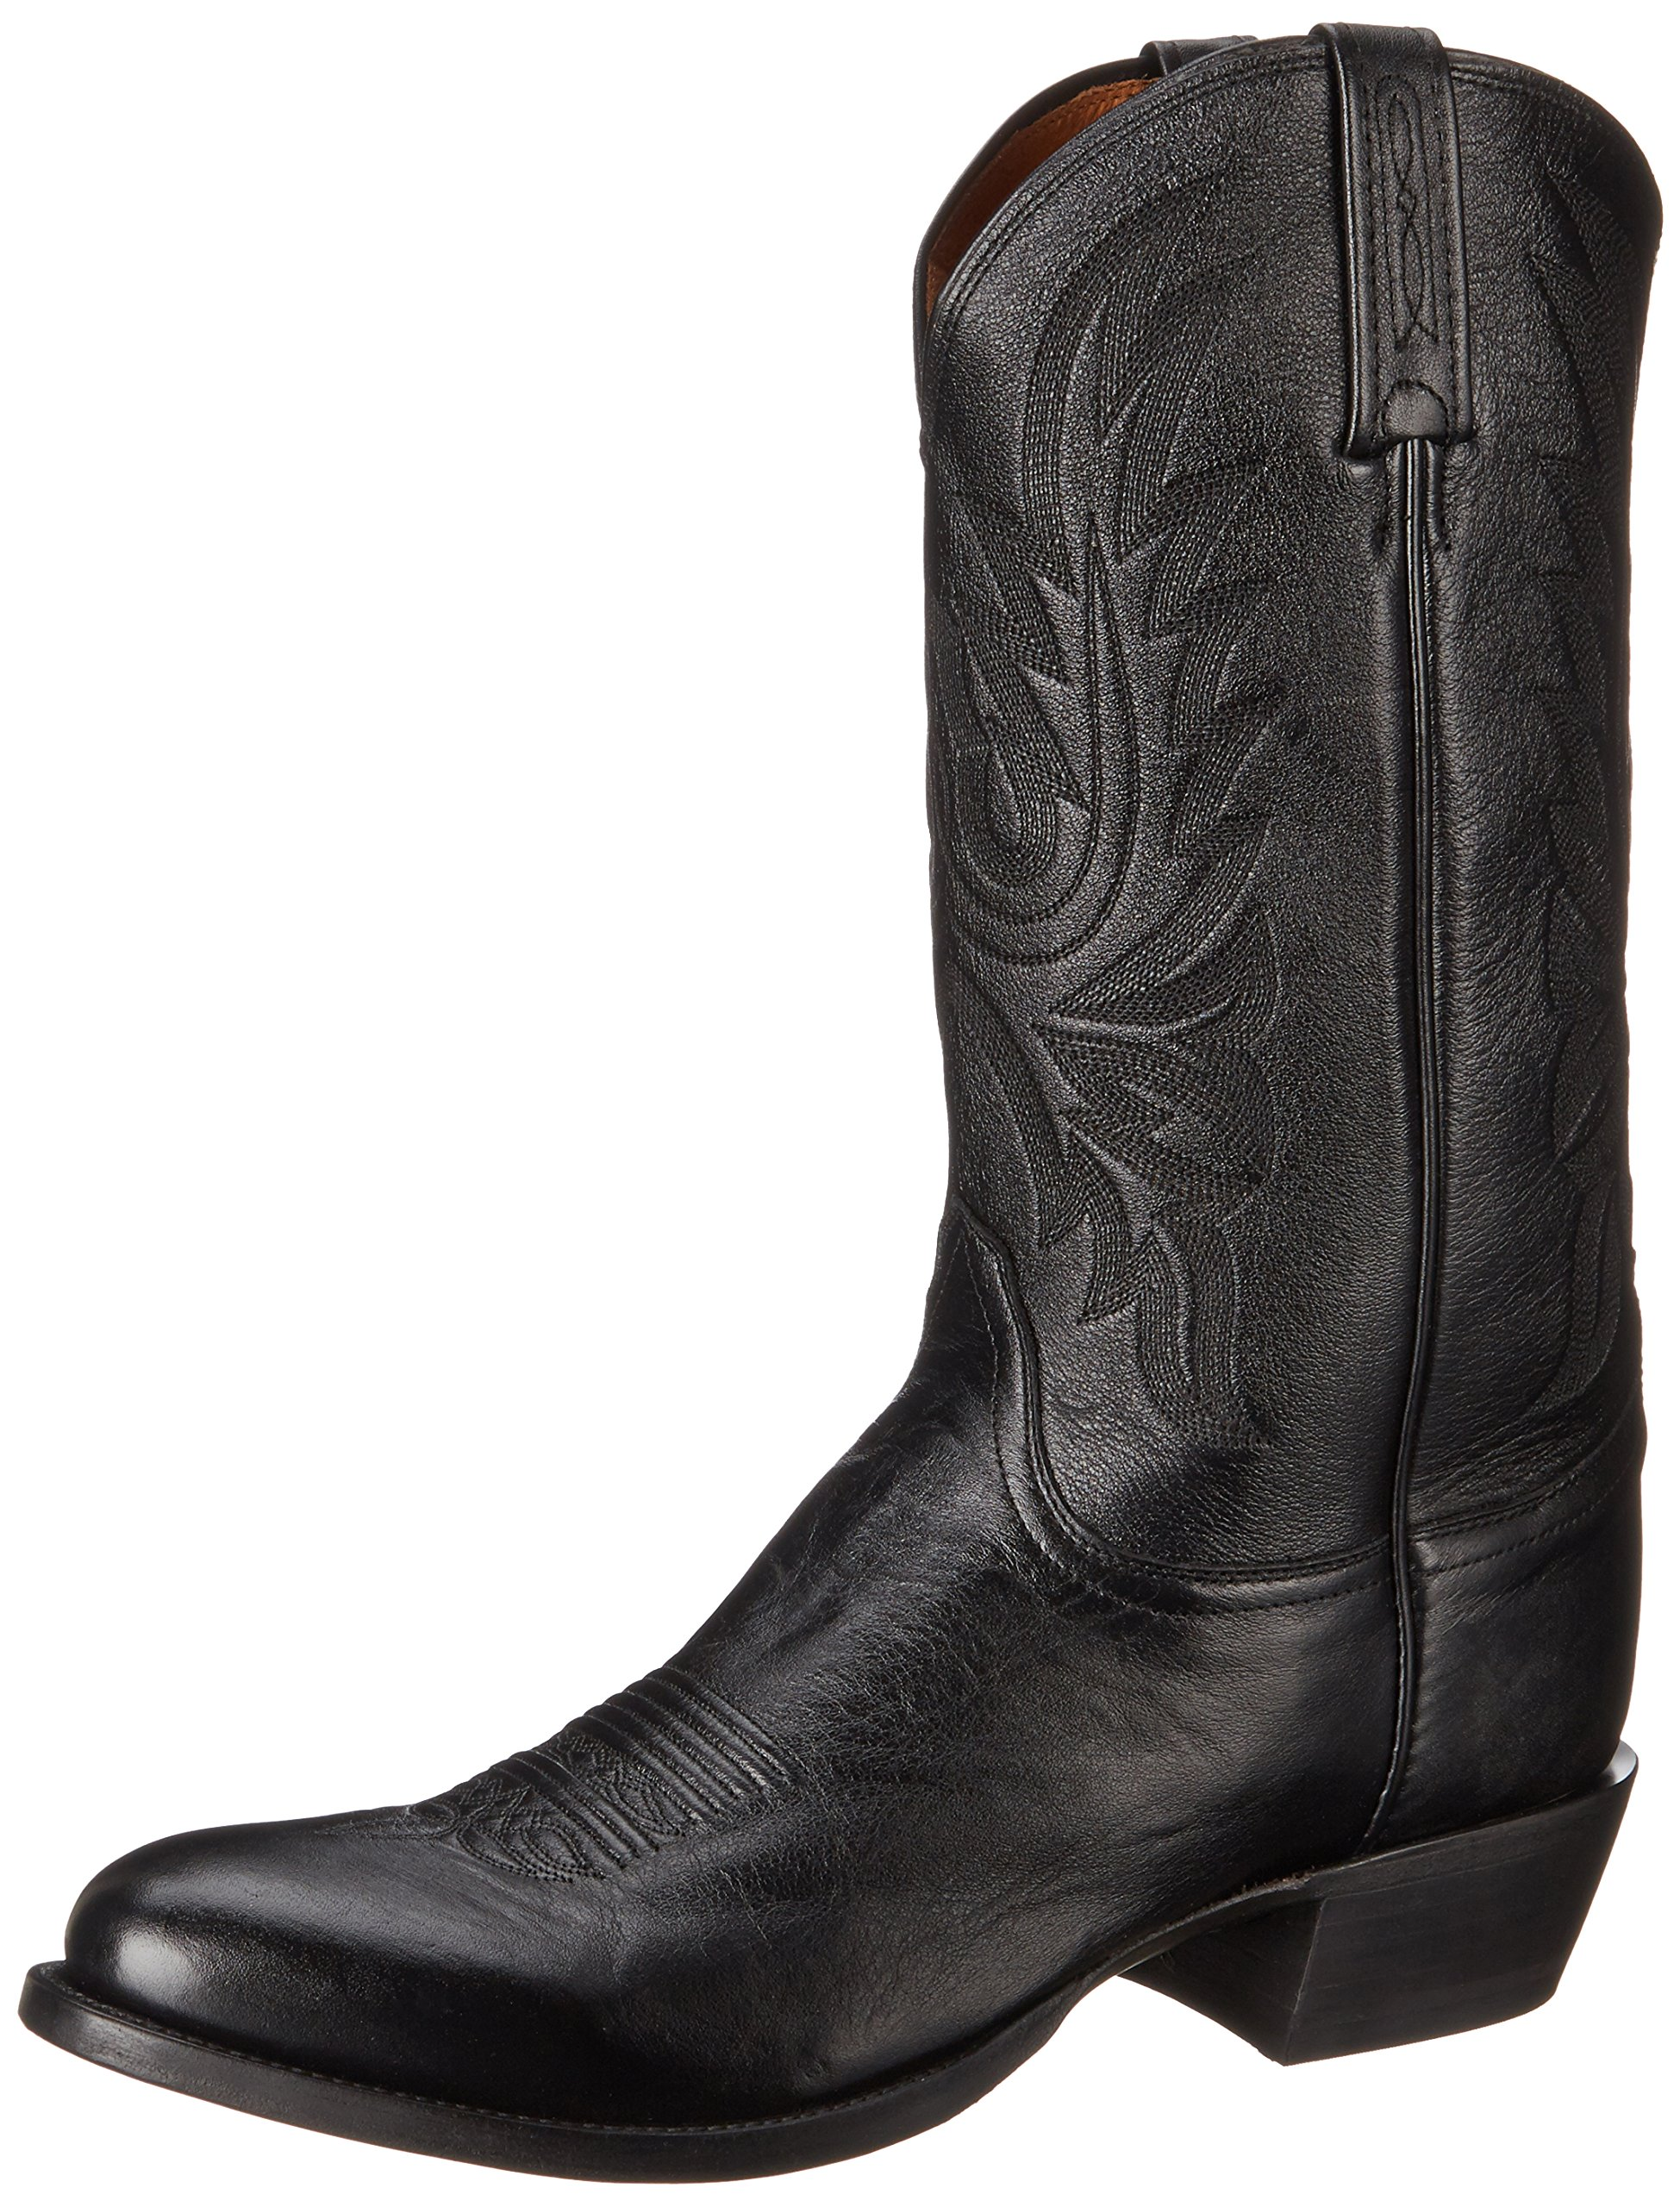 Lucchese Classics Men's Carso-blk Lonestar Calf Cowboy Riding Boot, Black, 10.5 D US